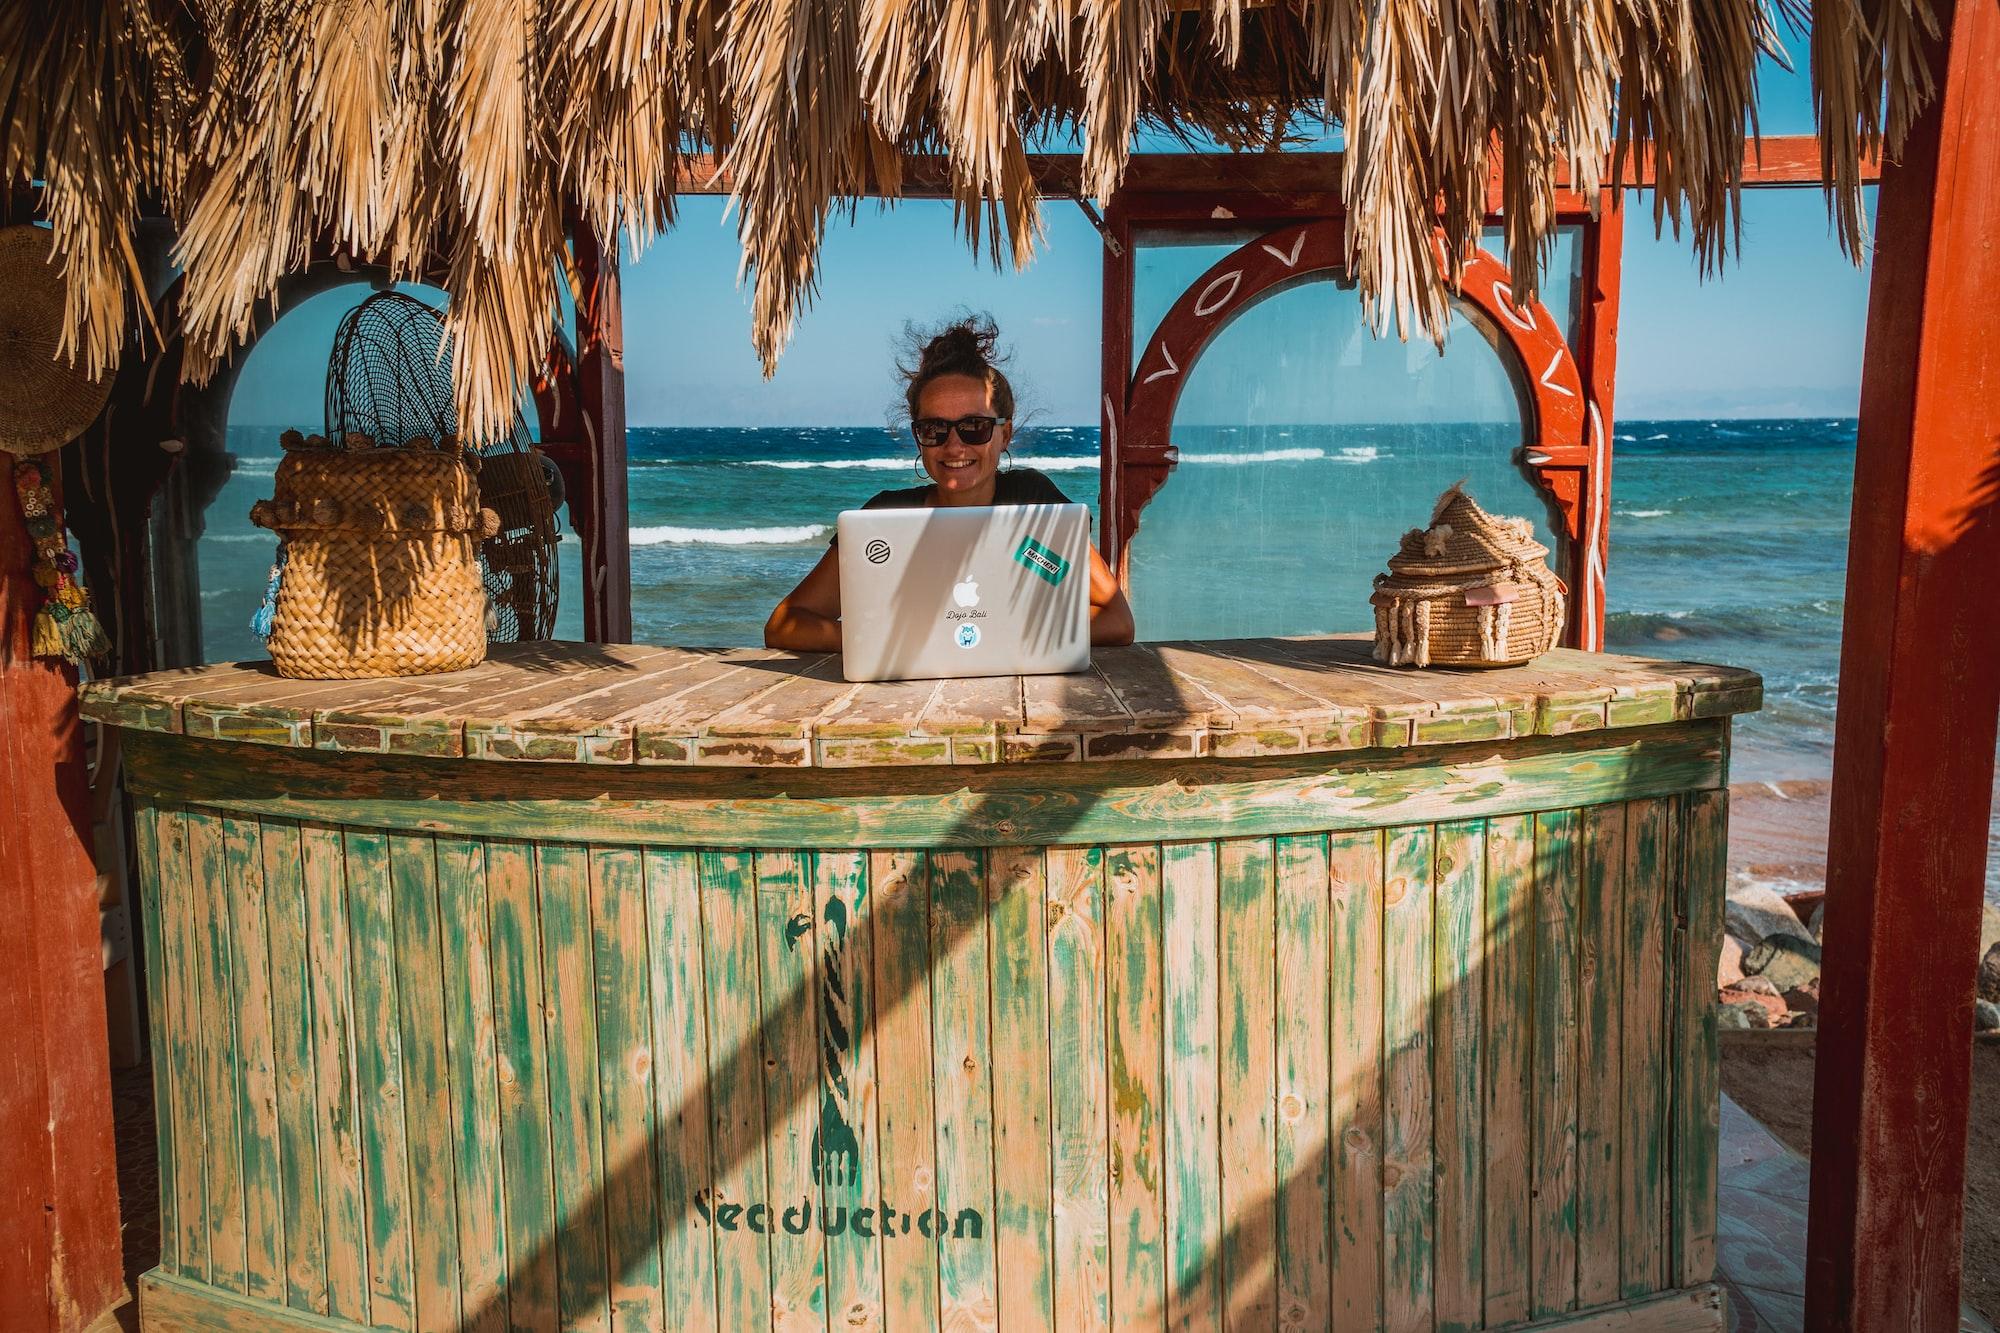 digital nomads can work everywhere